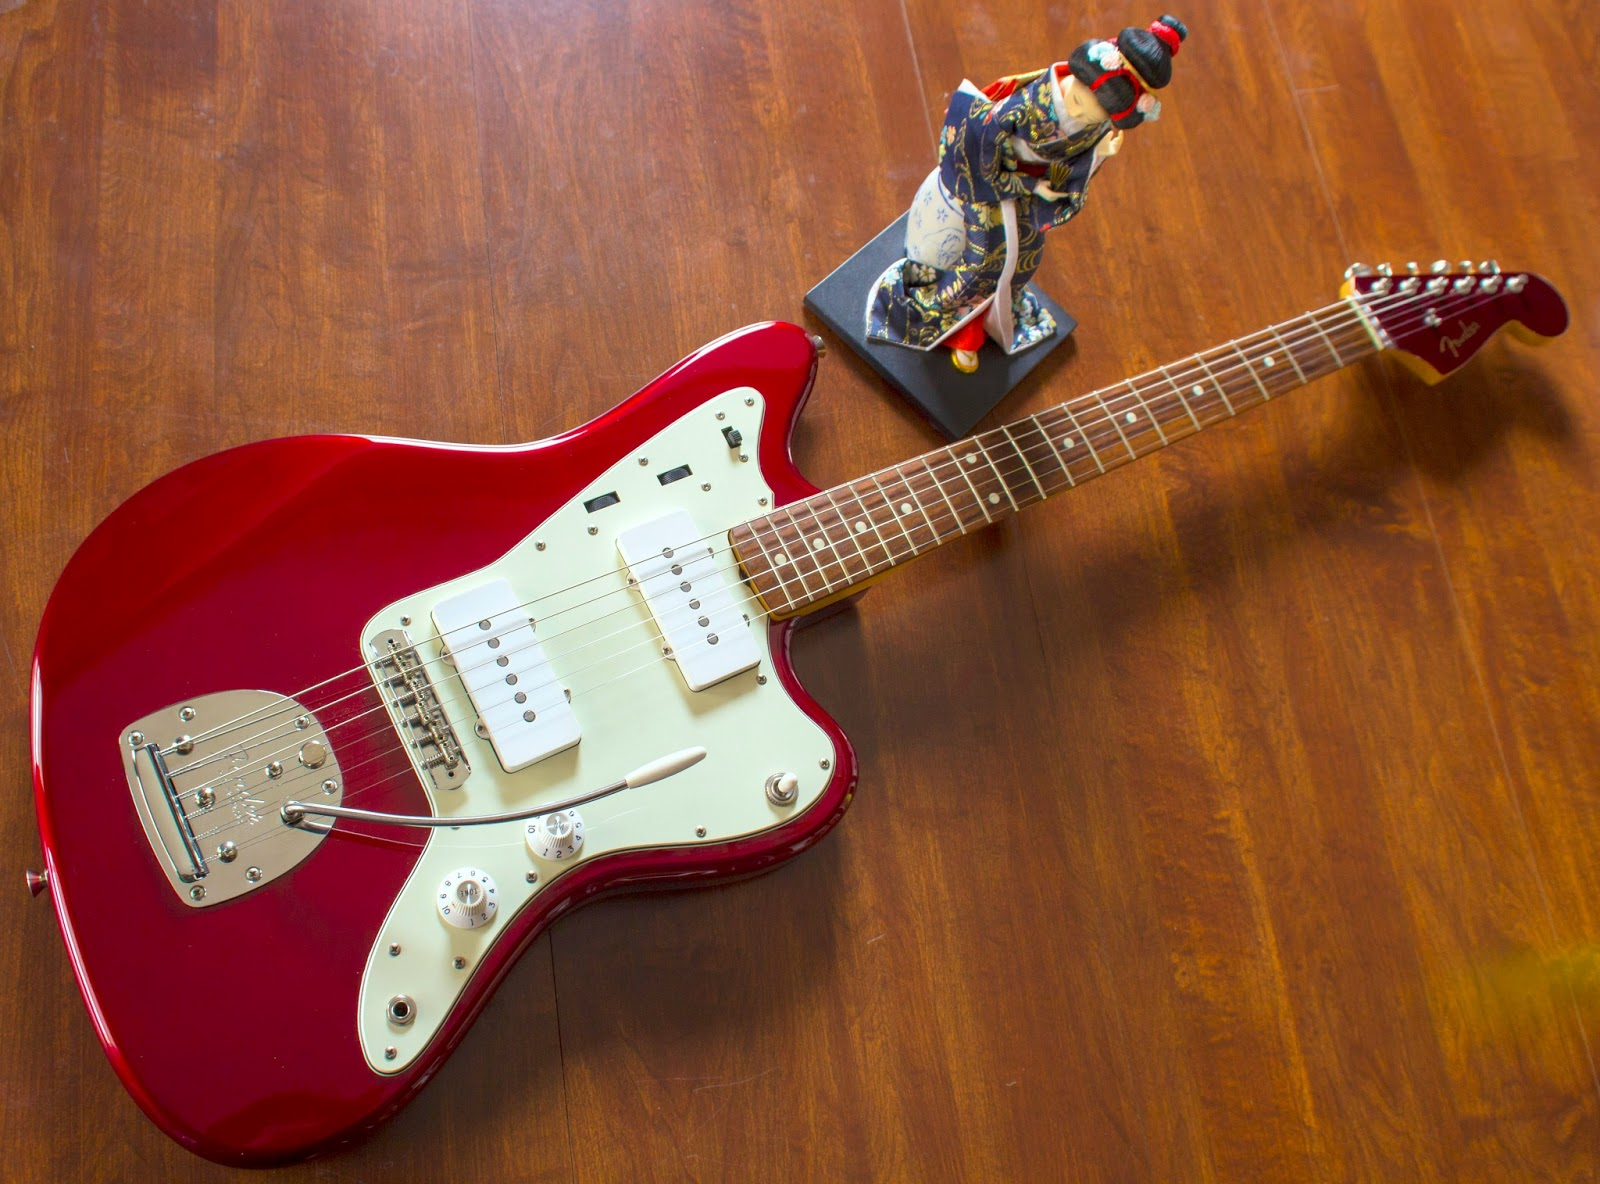 Vintage Fender Jaguar Wiring Upgrading All Fender Jazzmaster Wiring And Electronics In